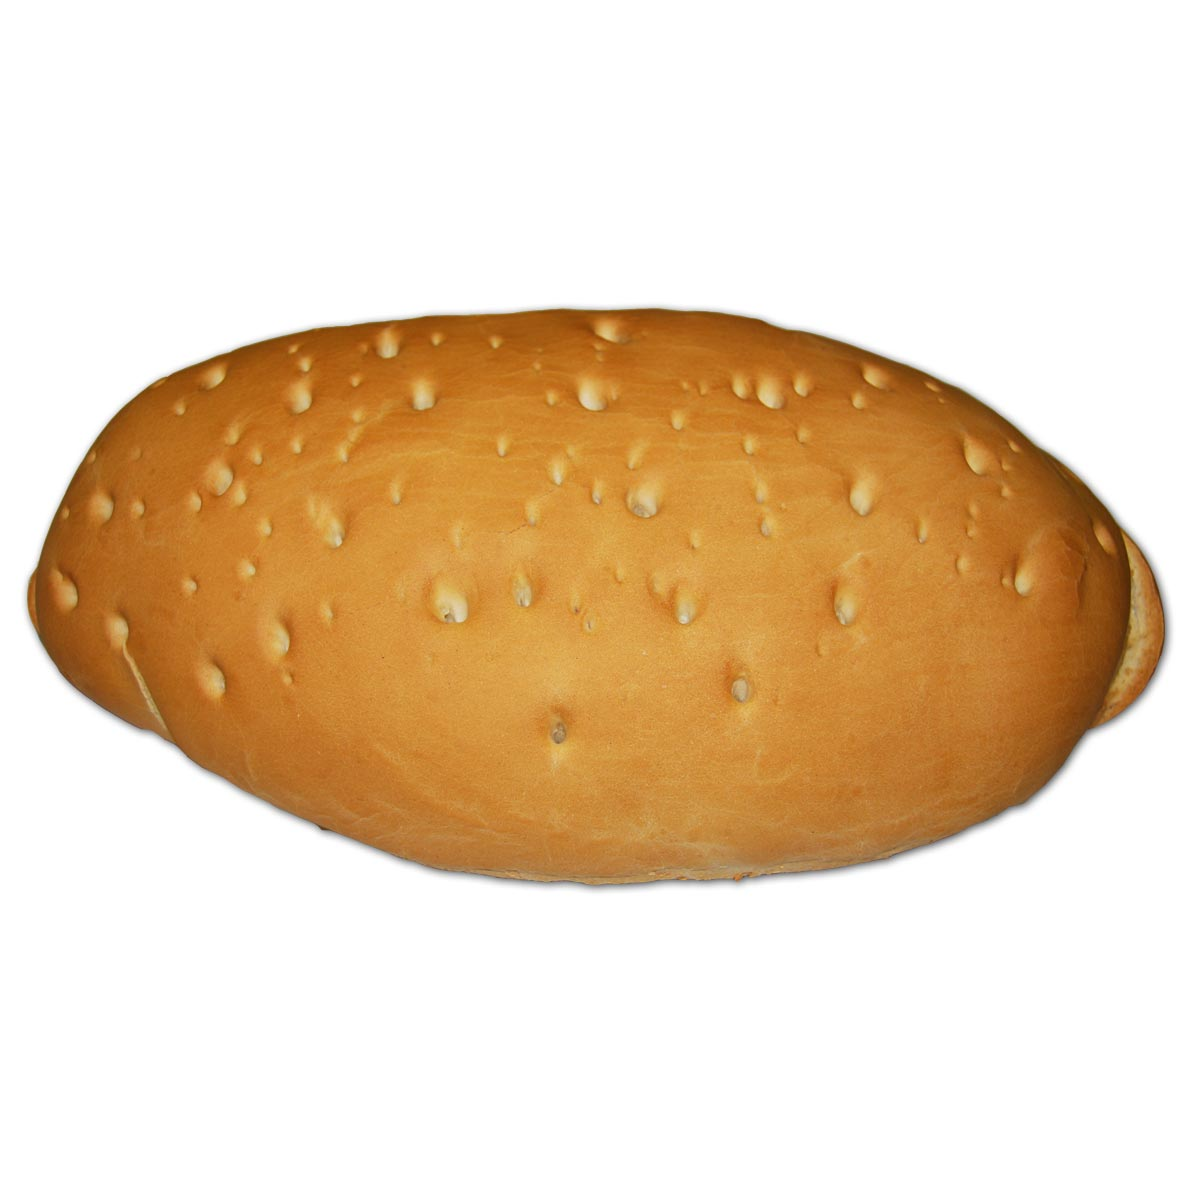 Pan Kilo Panaderia Hermanos Calvo Sevilla